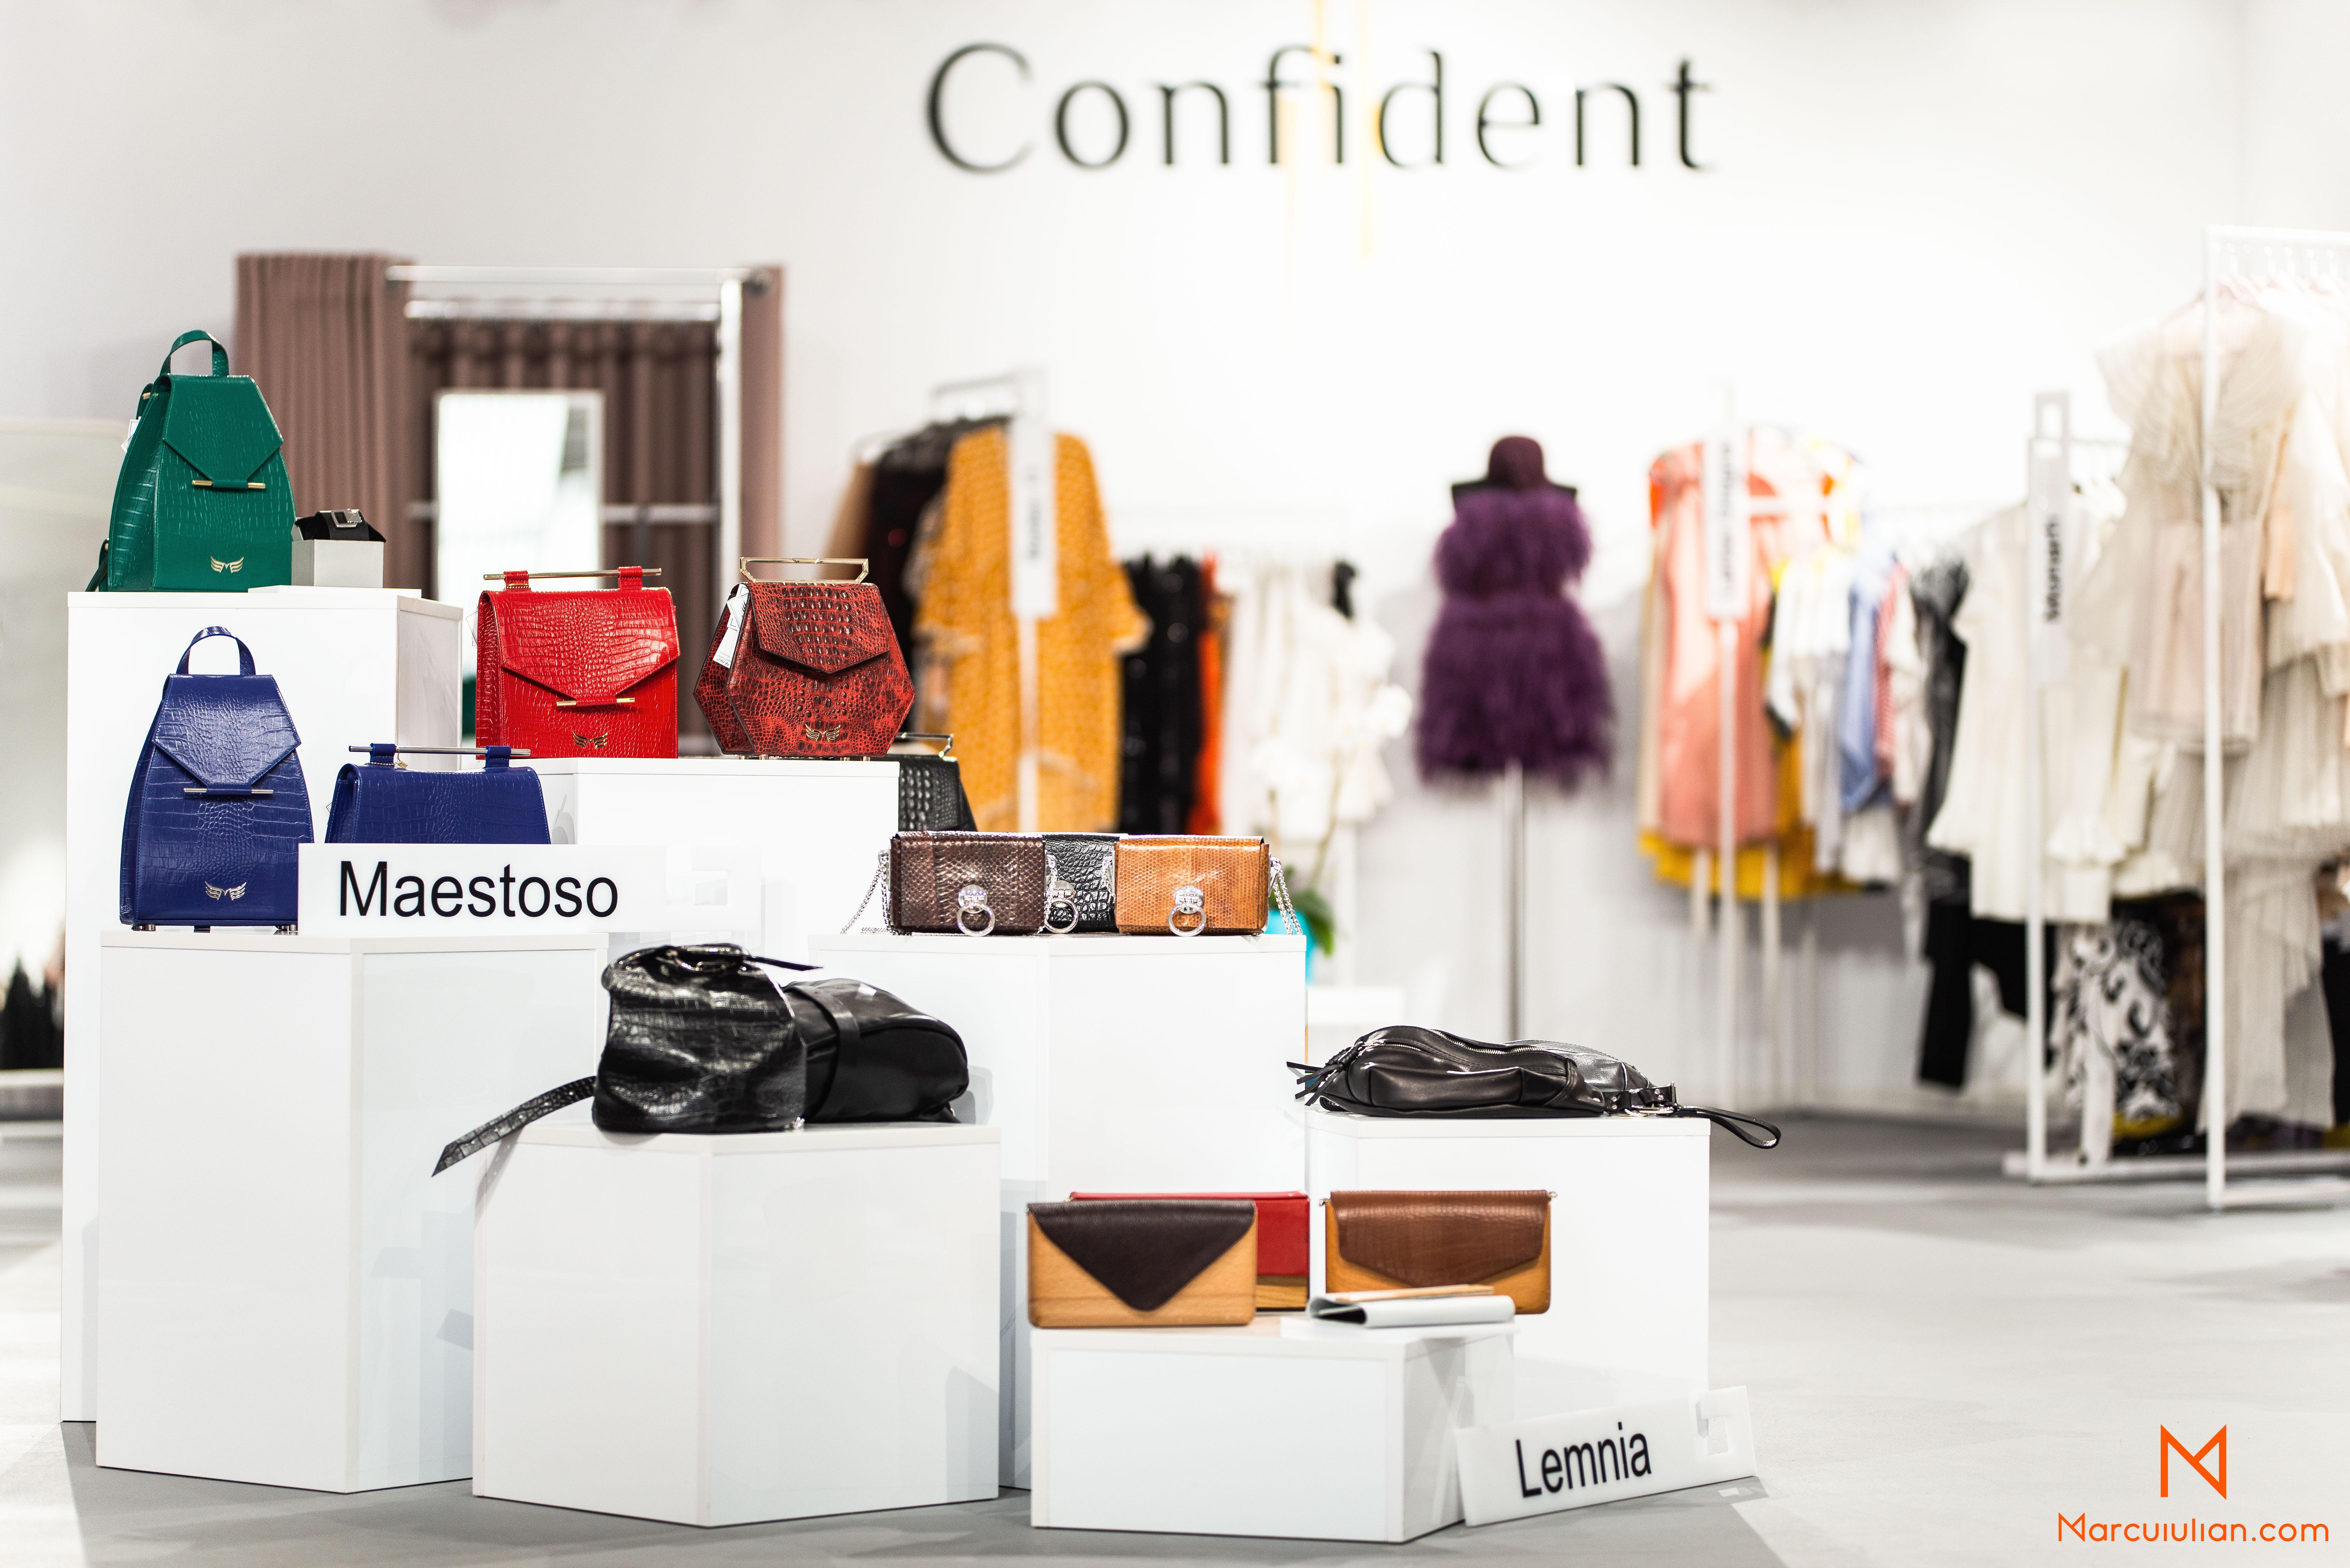 produse, posete, genti, haine, moda